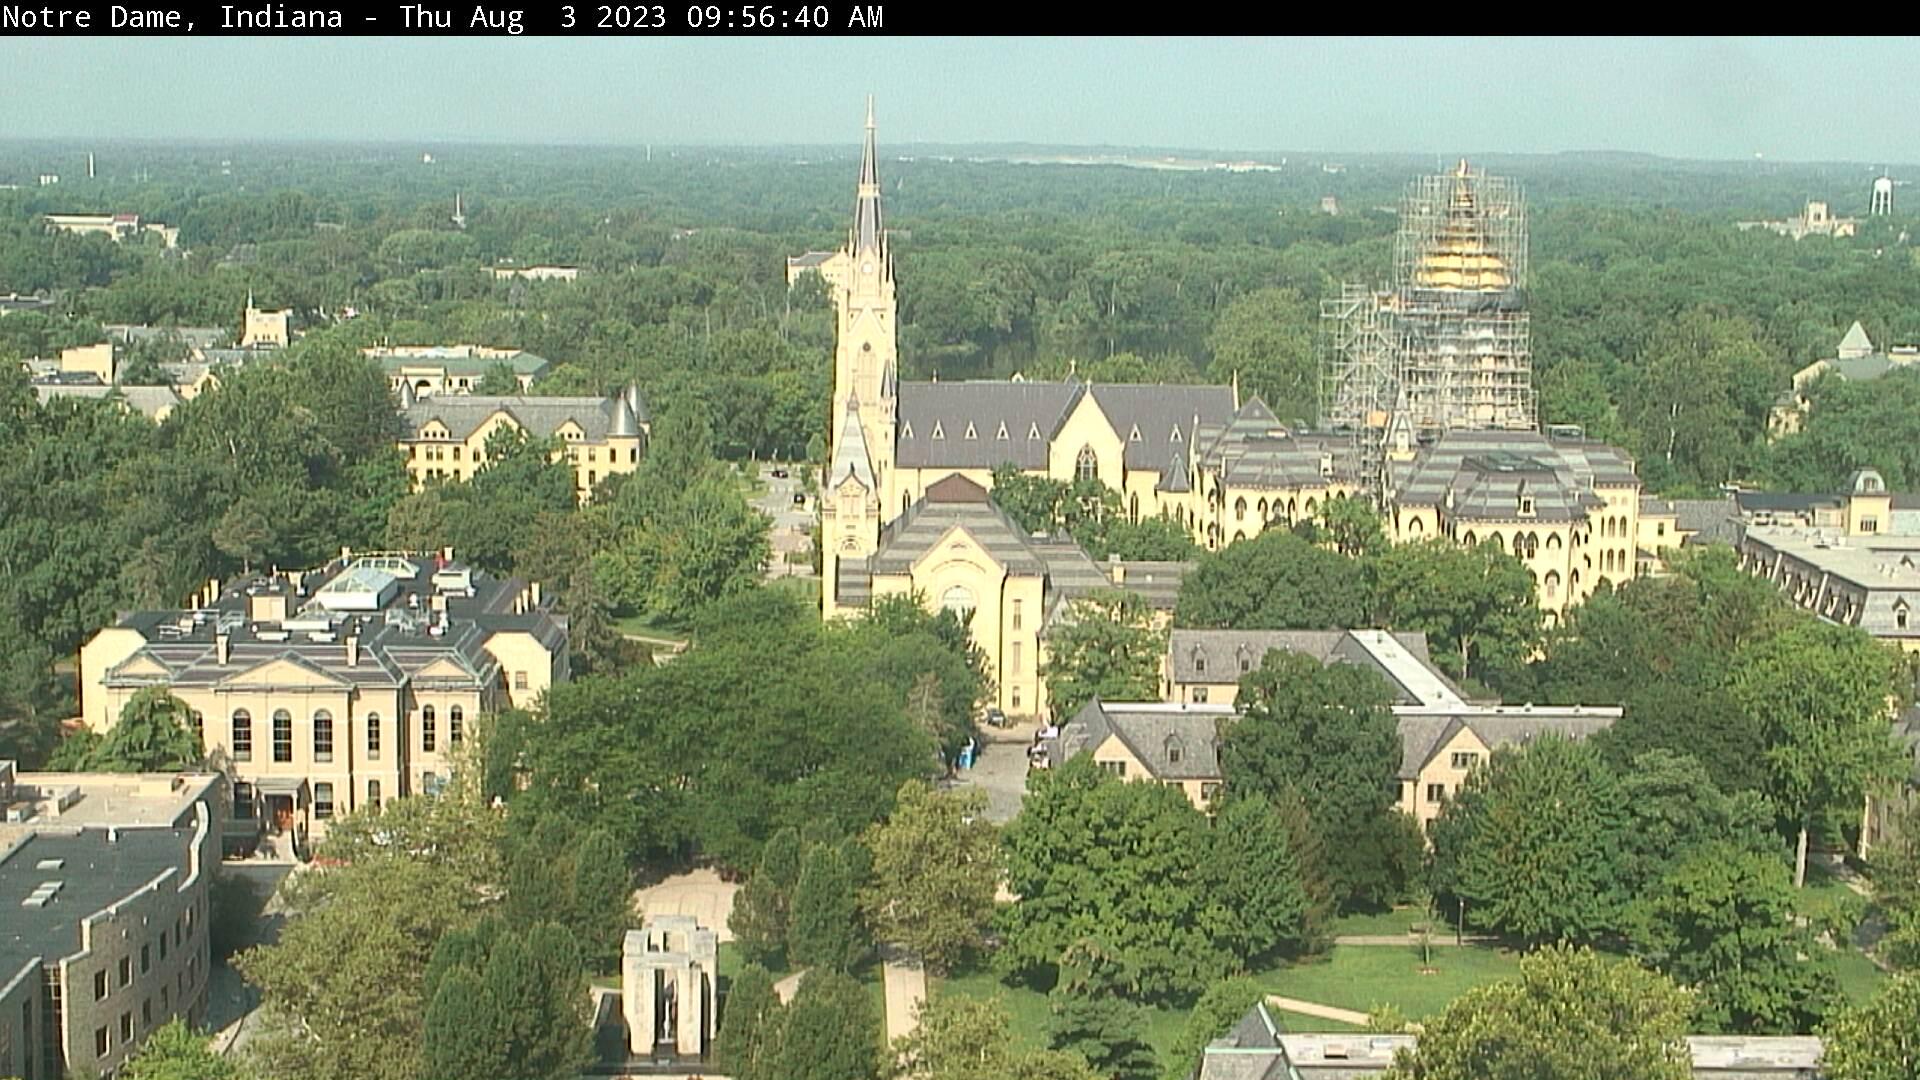 Notre Dame, Indiana Sat. 09:56